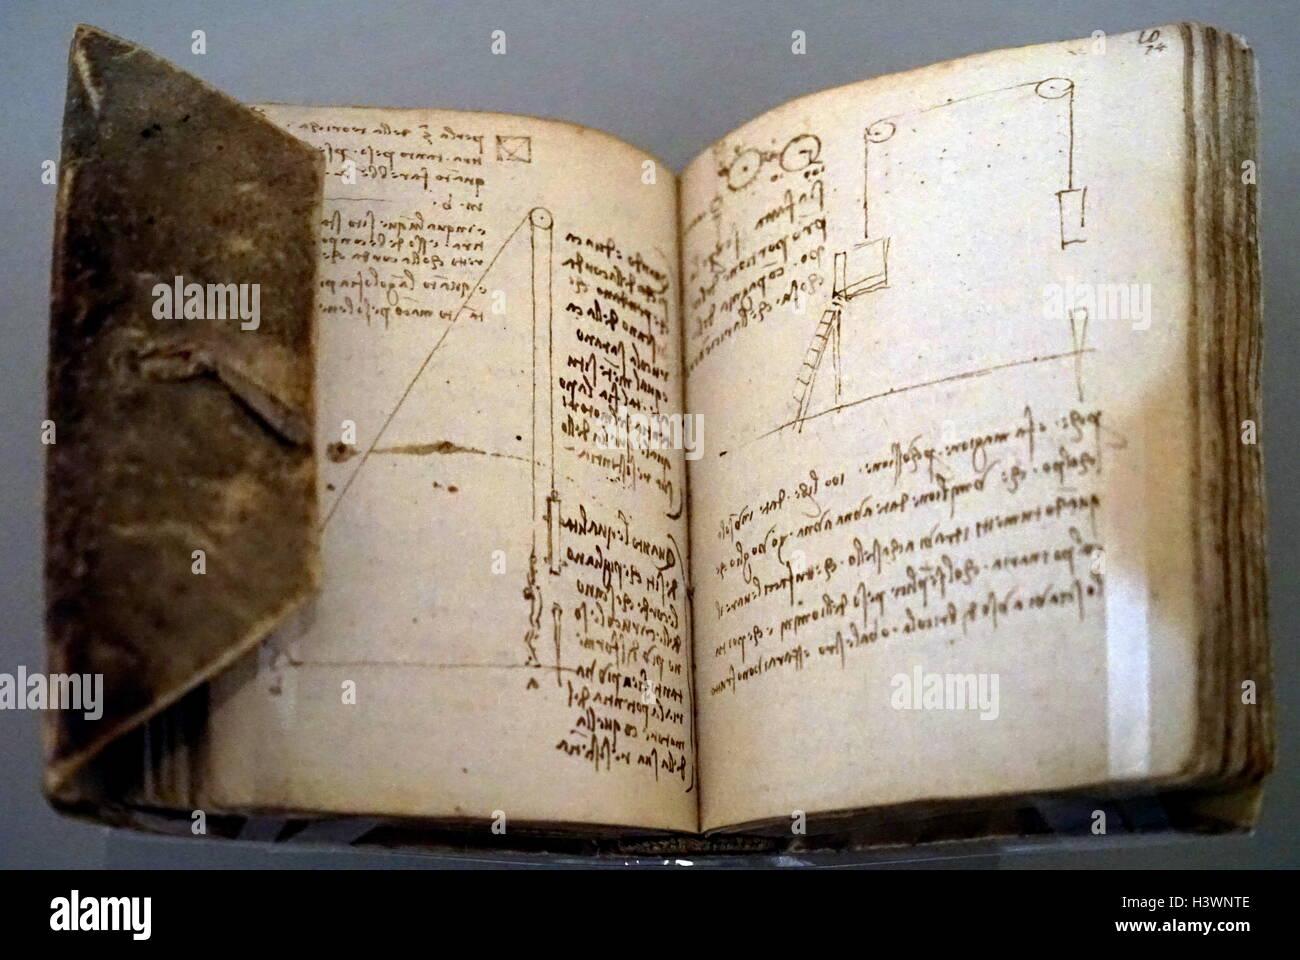 Part of The Codex Forster II by Leonardo da Vinci - Stock Image